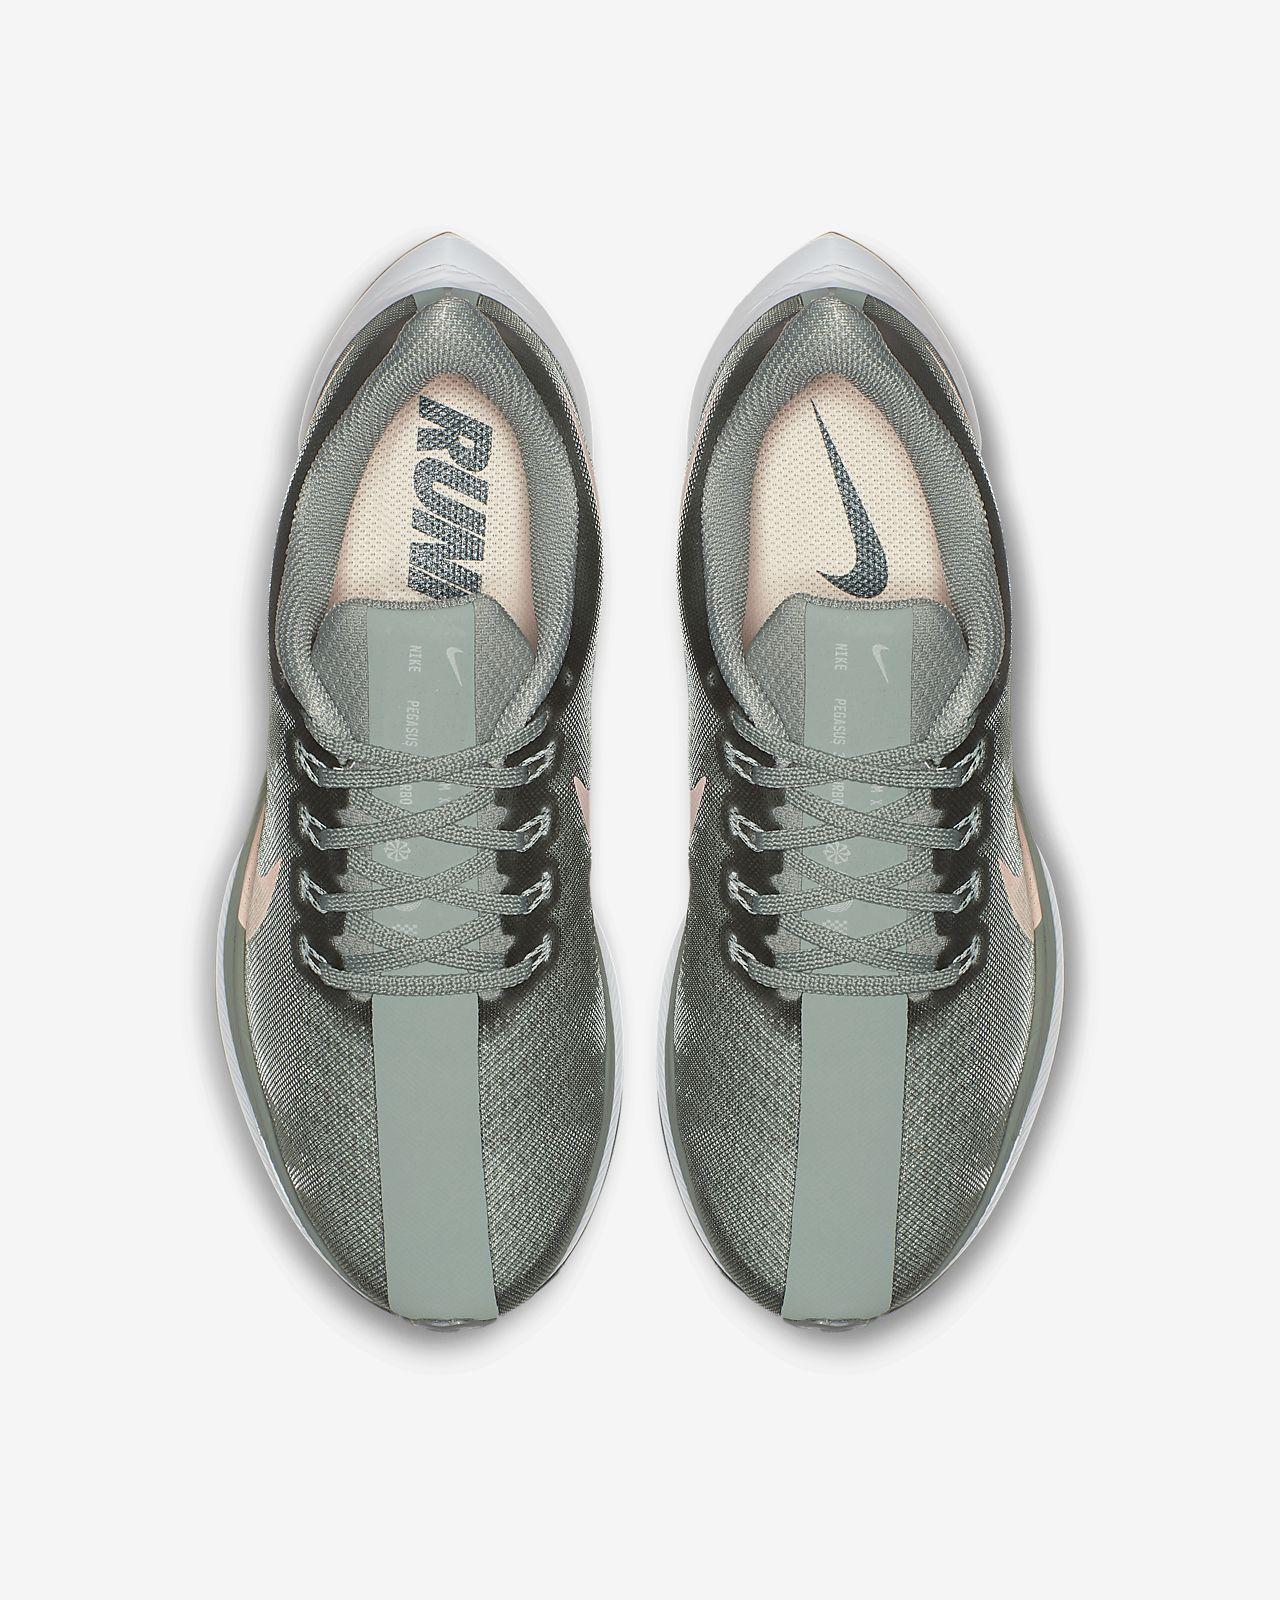 a340d4f8afee Nike Zoom Pegasus Turbo Women s Running Shoe. Nike.com DK